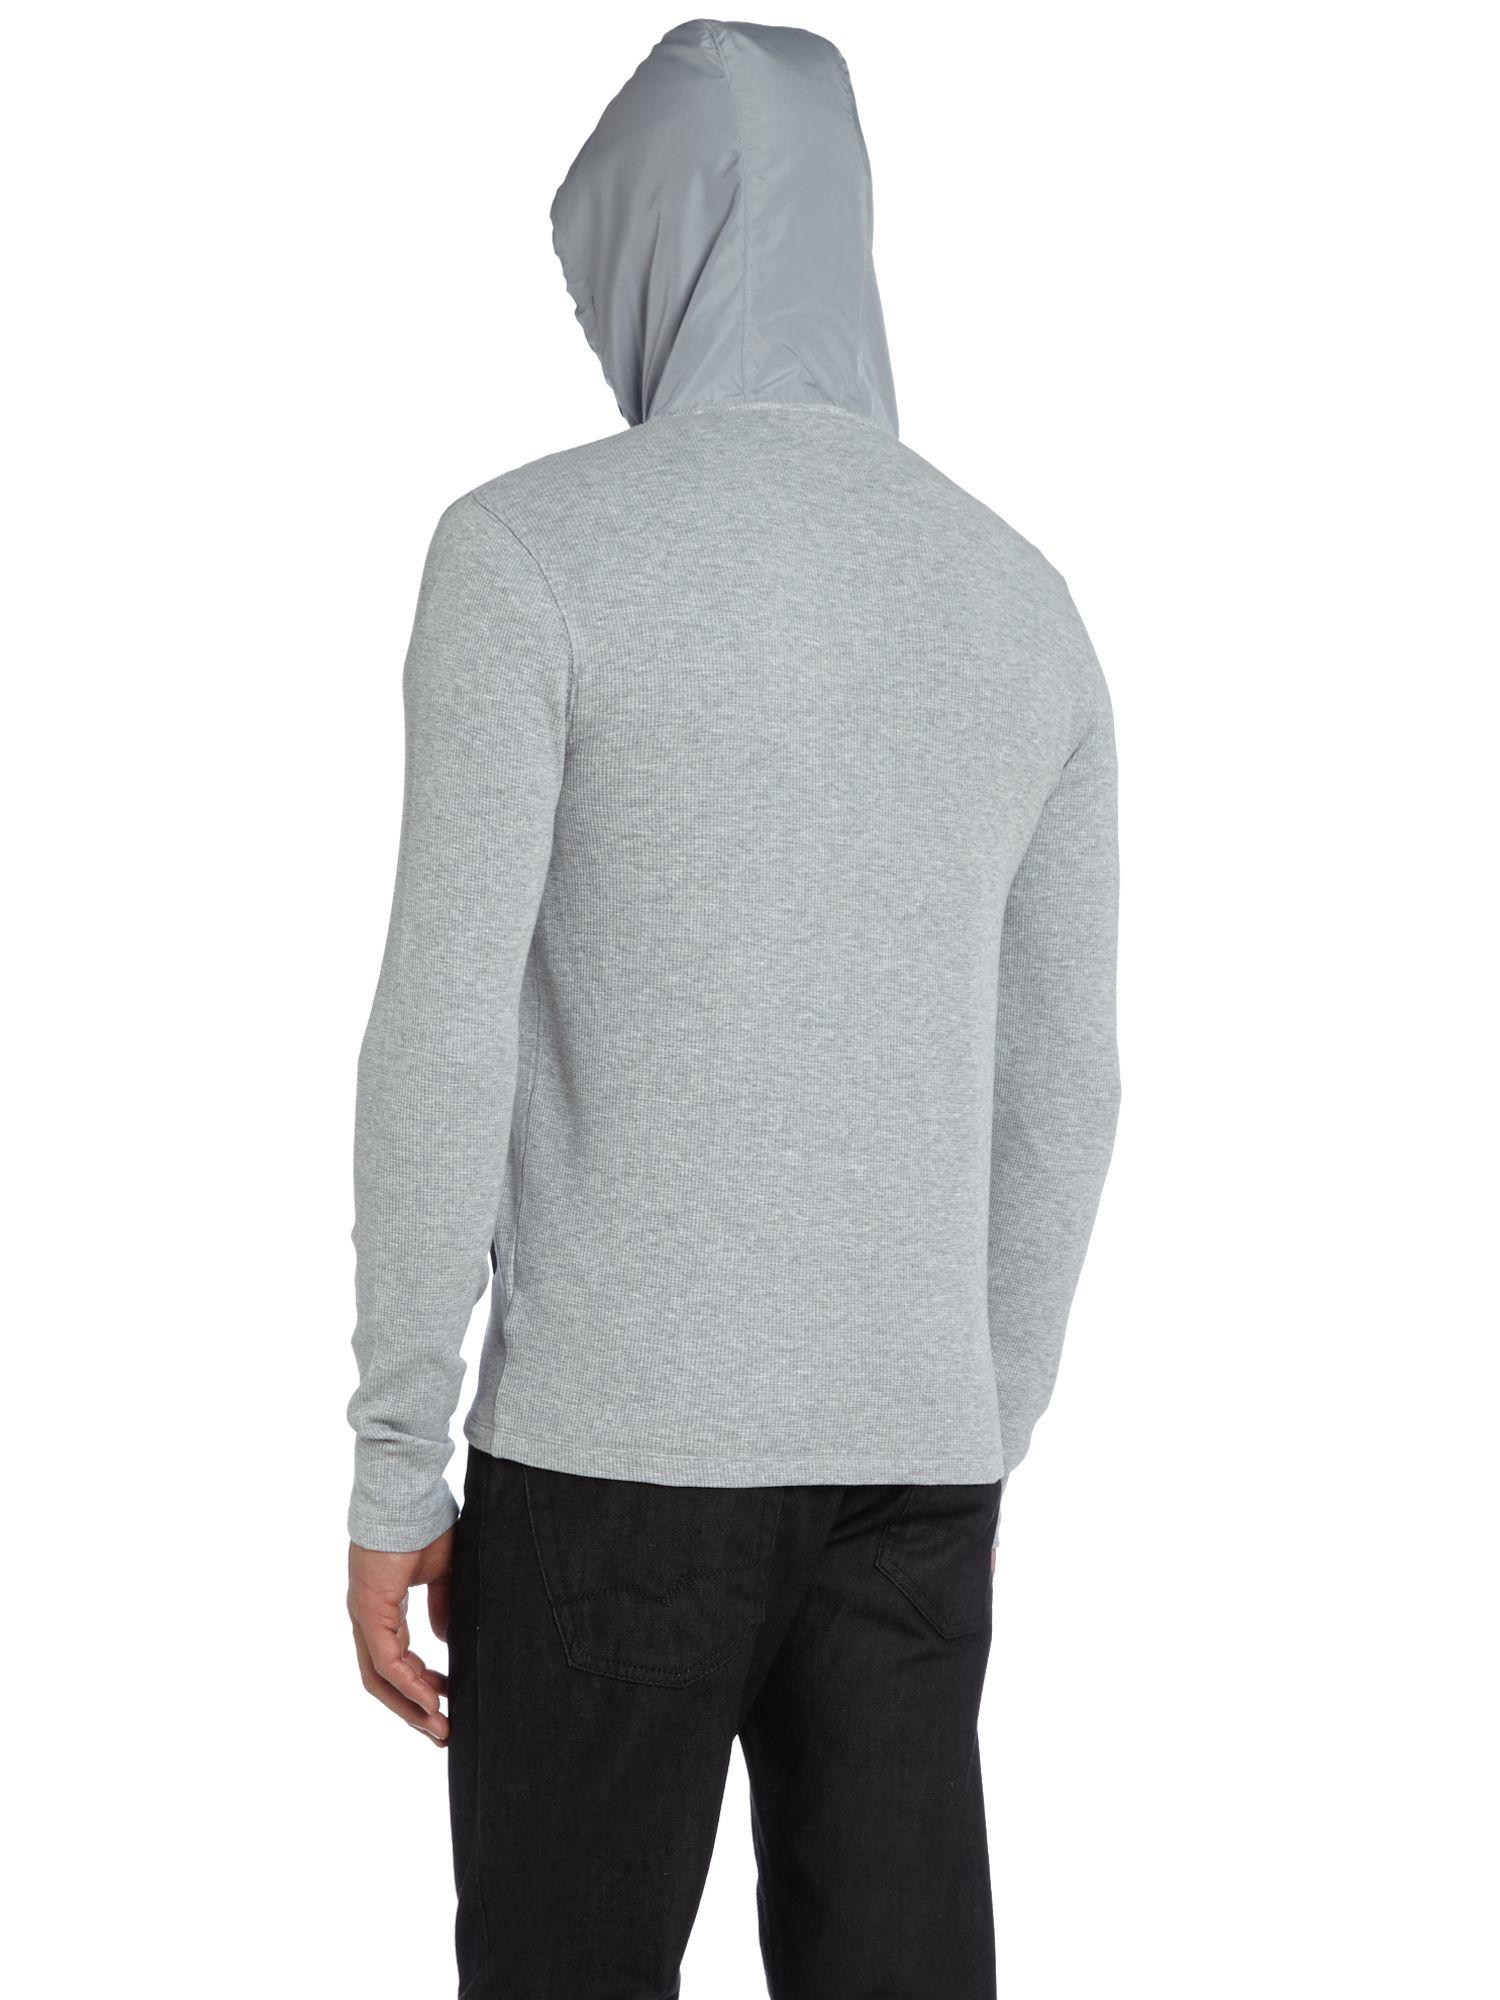 Michael Kors Zip Up Waffle Hooded Jacket in Heather (Grey) for Men